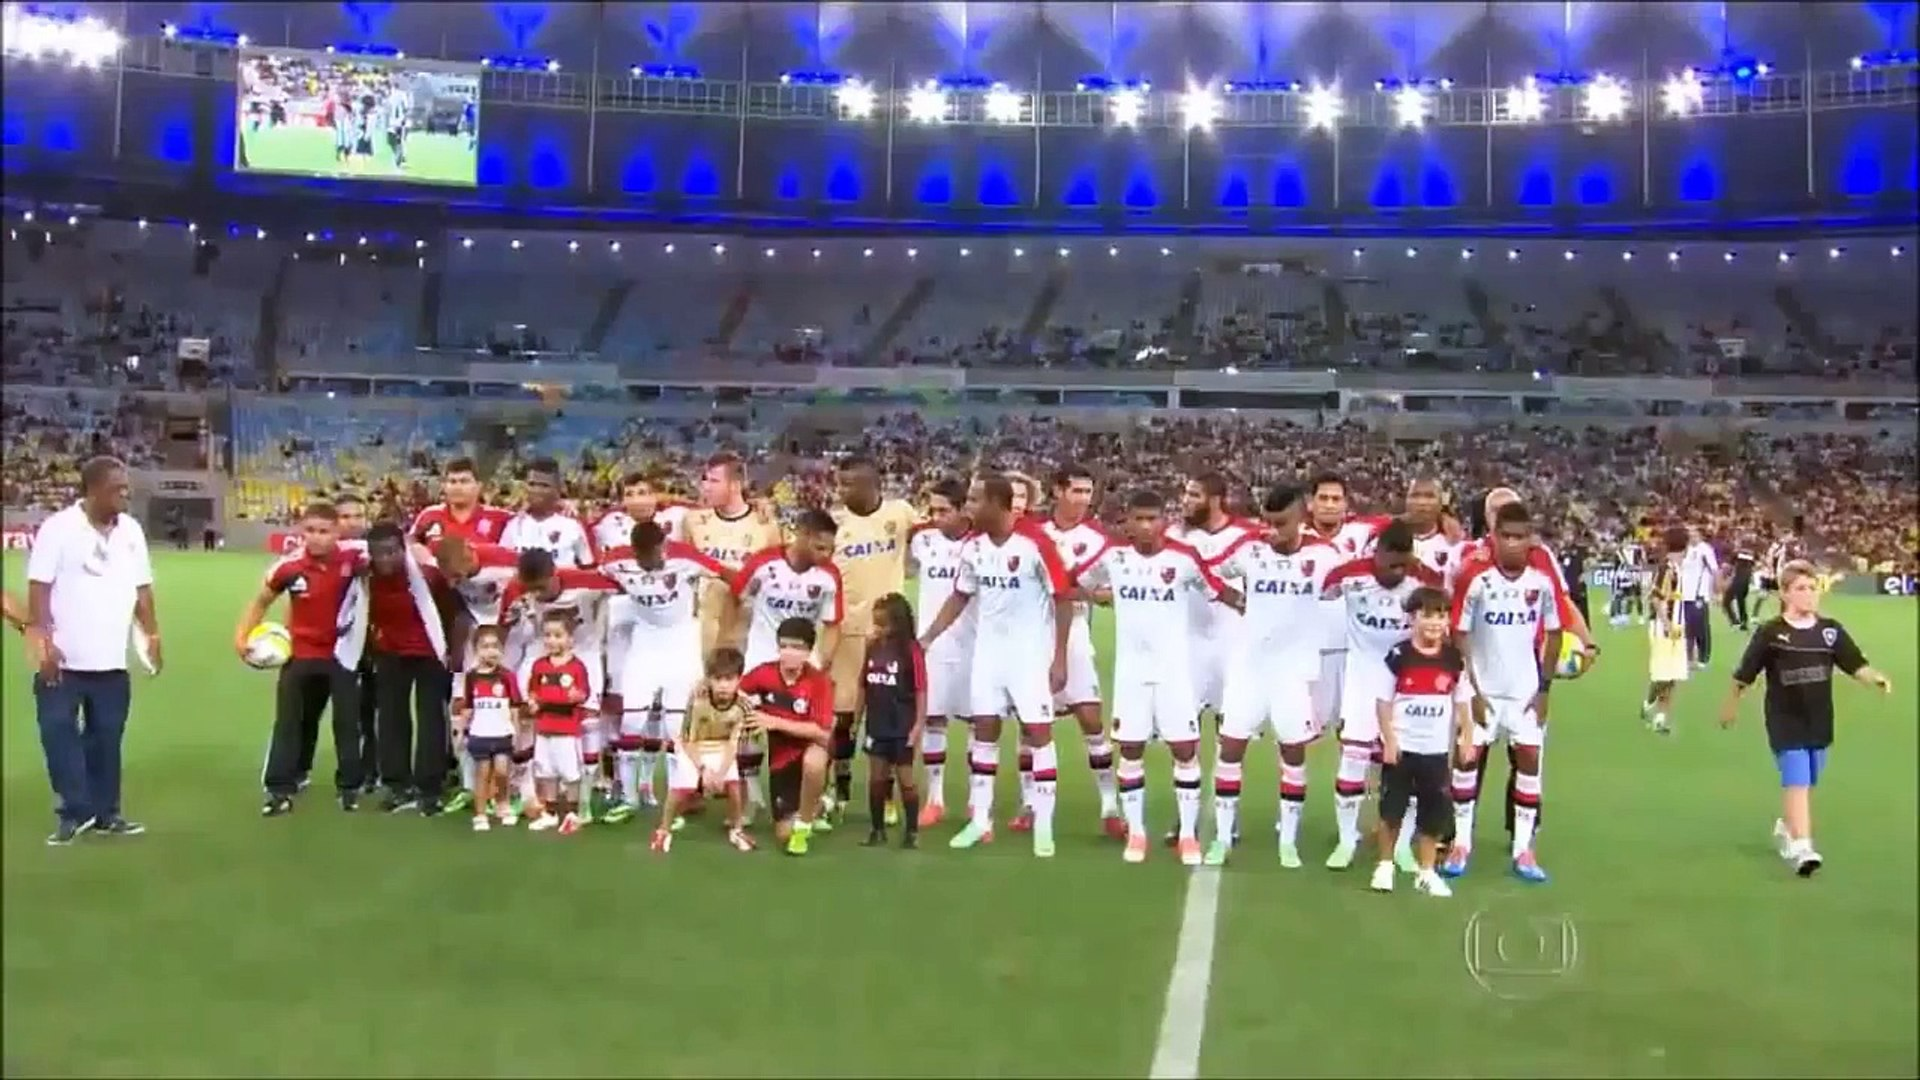 Flamengo Campeão da Taça Guanabara (Carioca) 2014 - Globoesporte